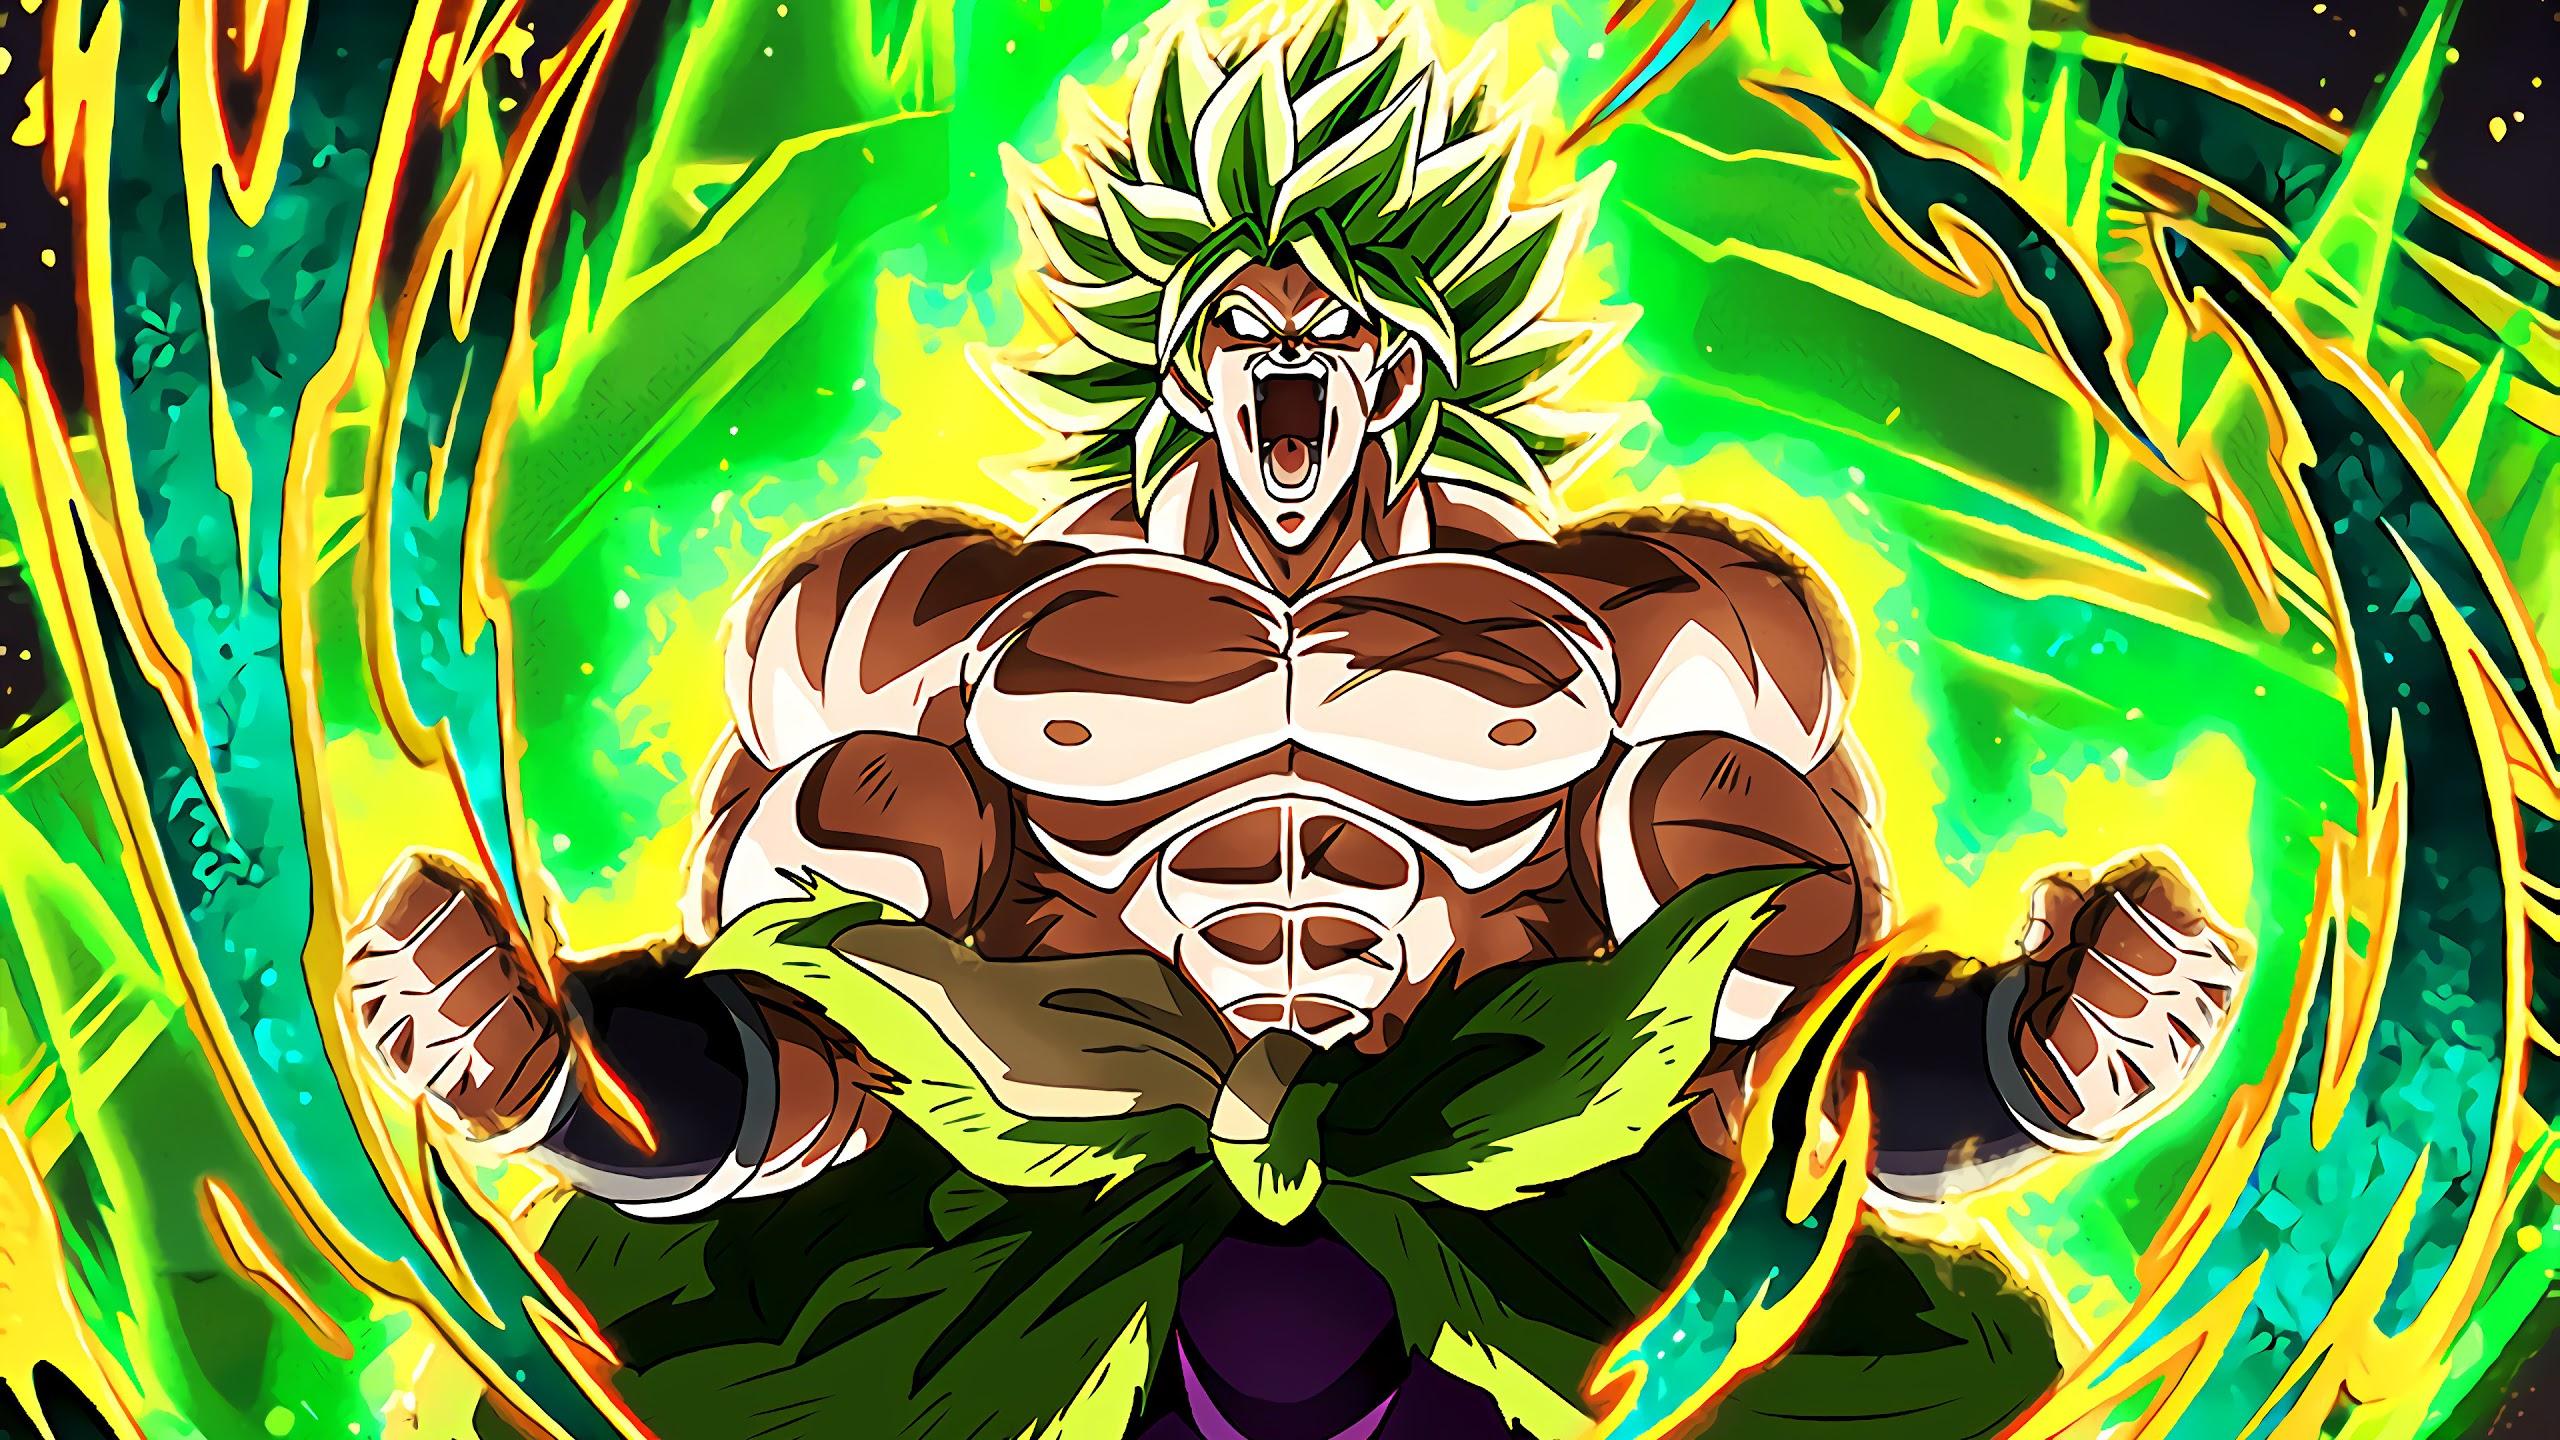 Free Download Broly Legendary Super Saiyan Dragon Ball Super Broly